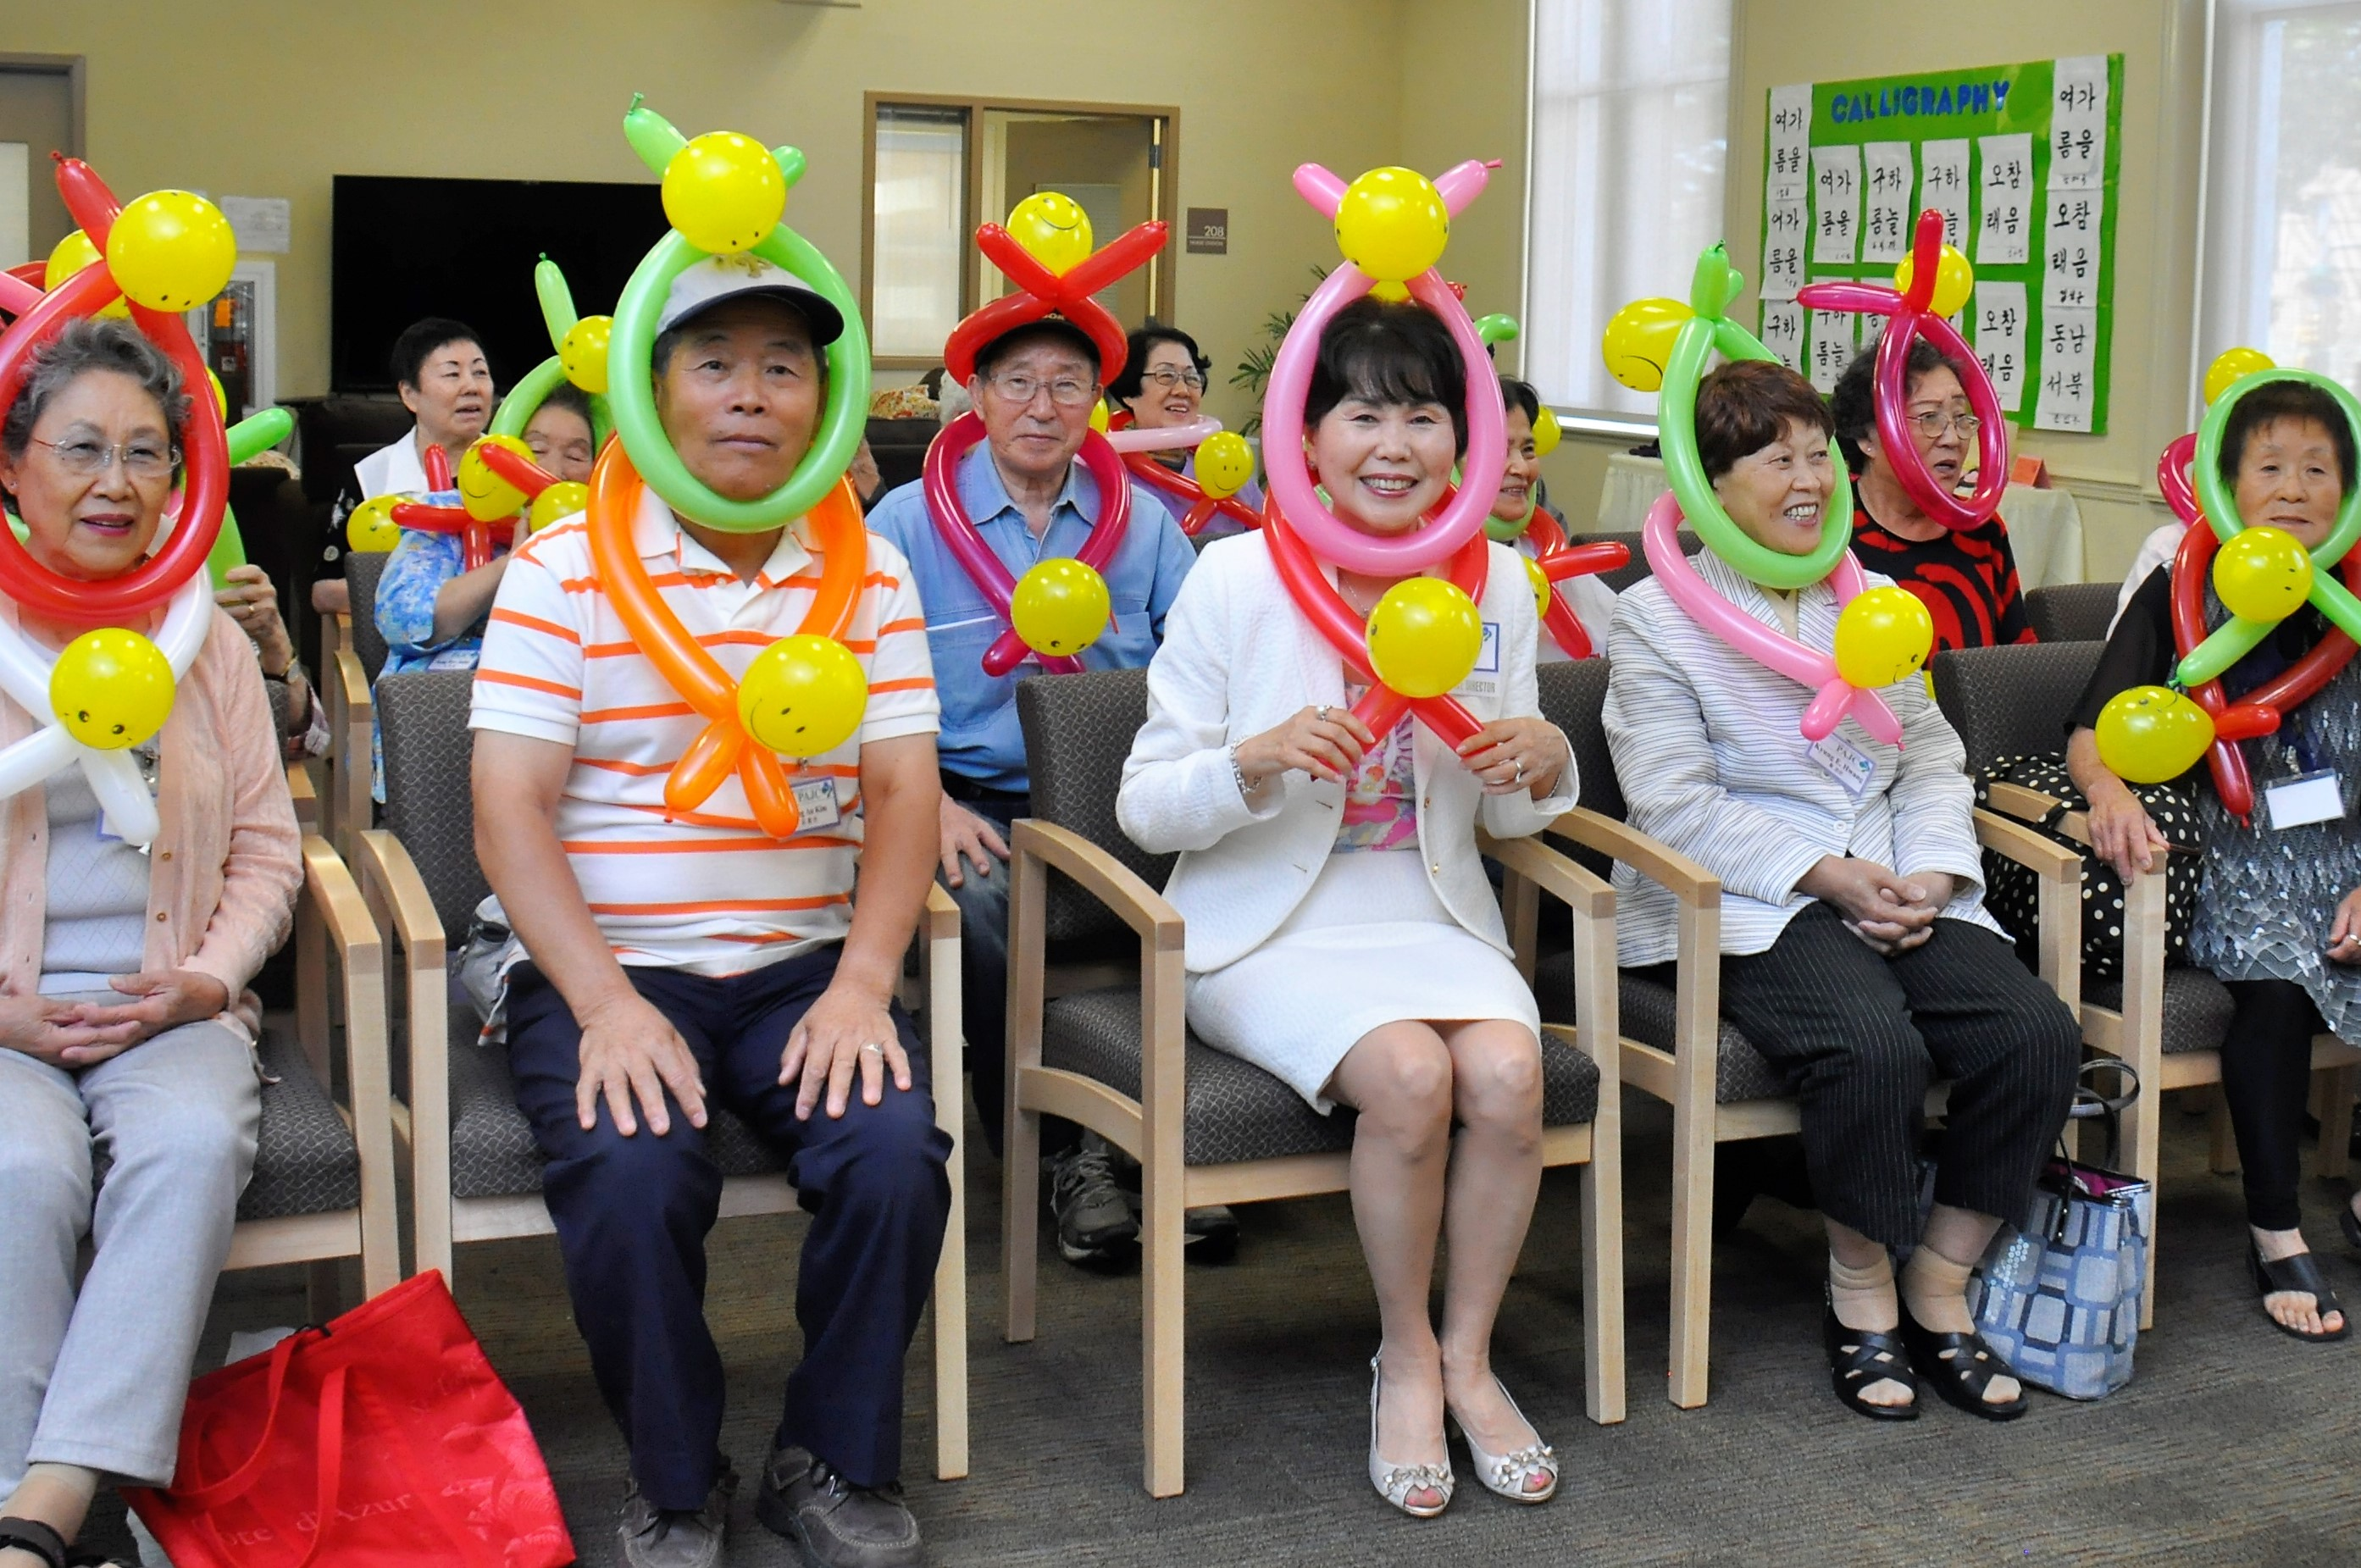 Asian senior services images